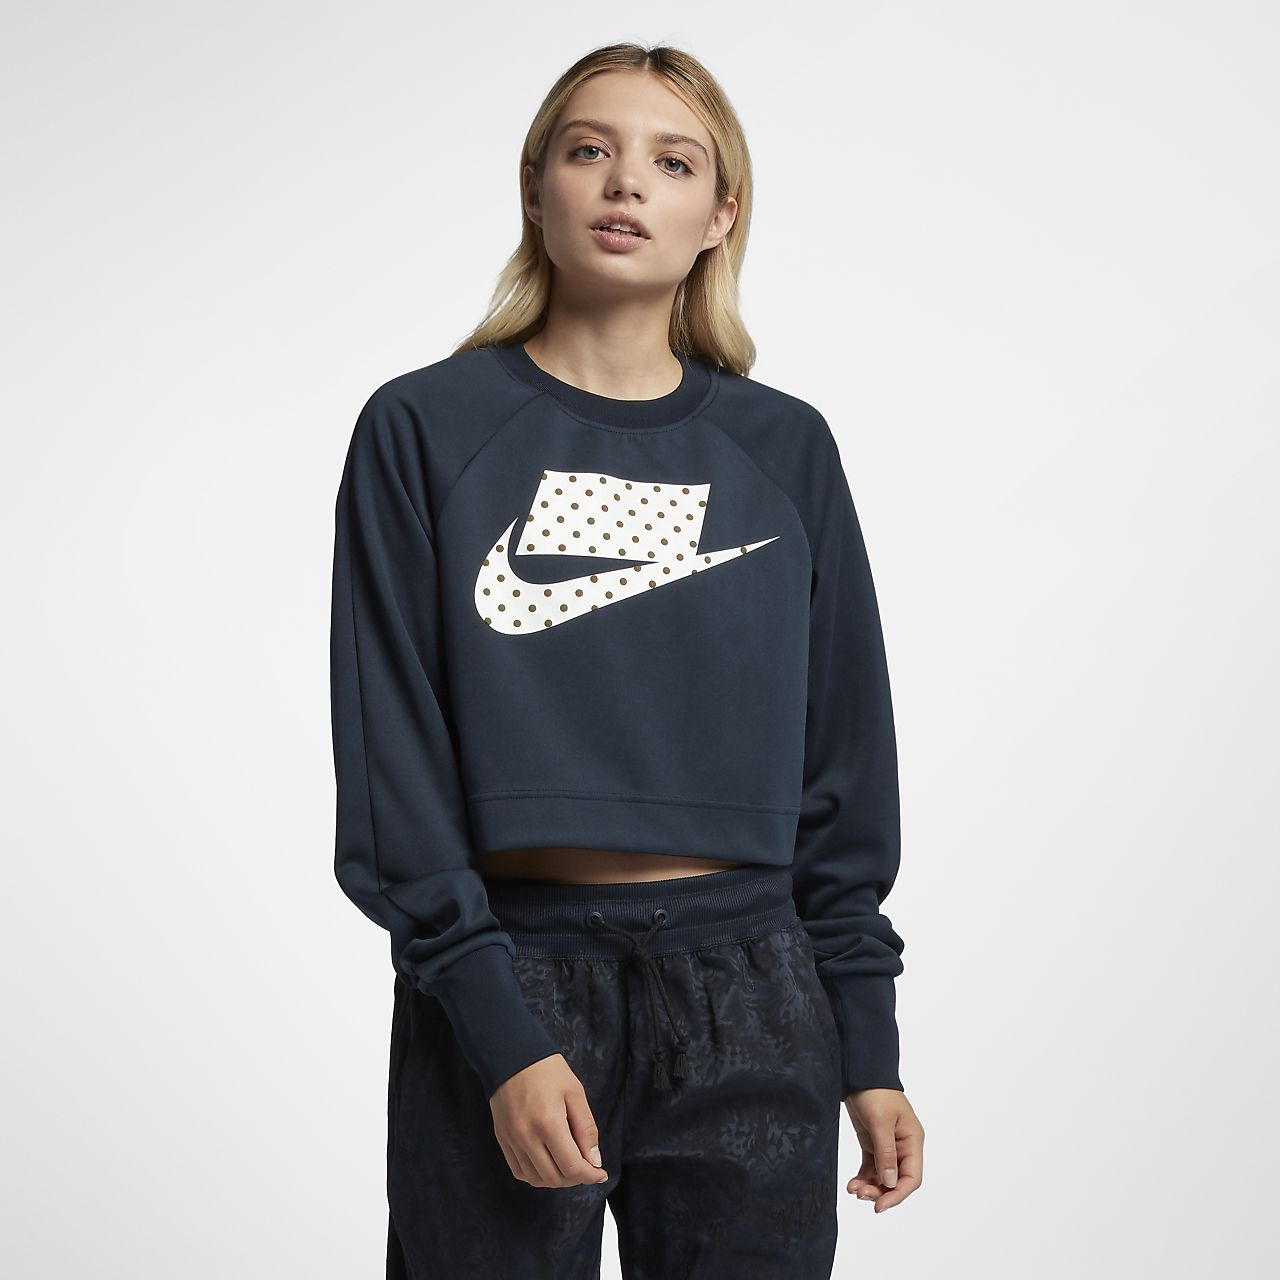 Haut court Nike Sportswear pour Femme